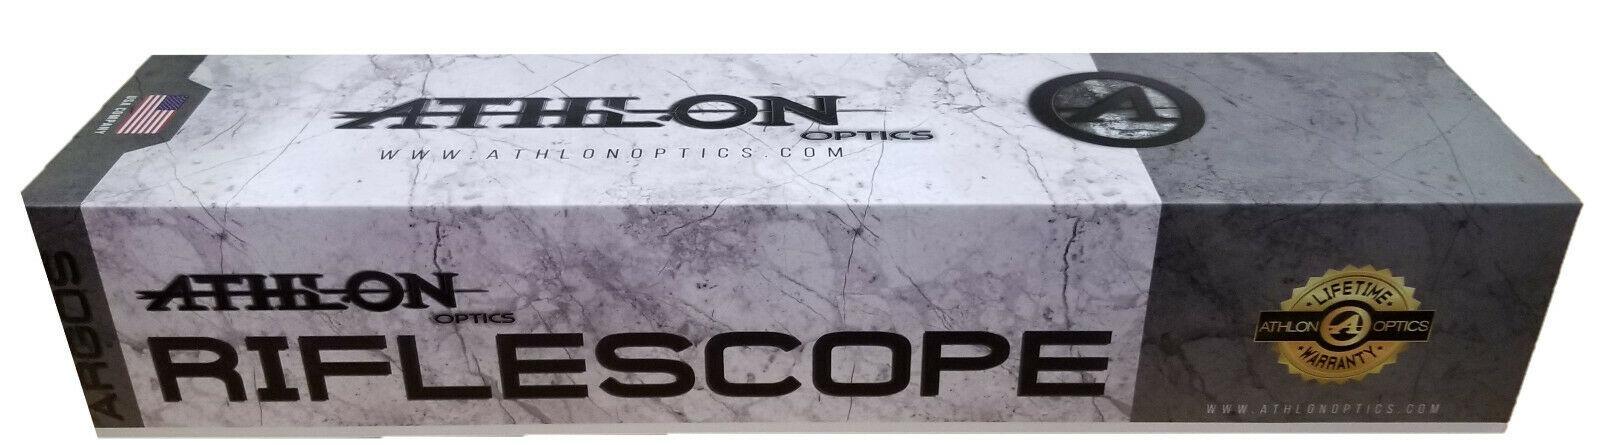 Athlon Optics Argos BTR 6-24×50 APMR FFP IR MIL Scope 214061 Lifetime Warranty